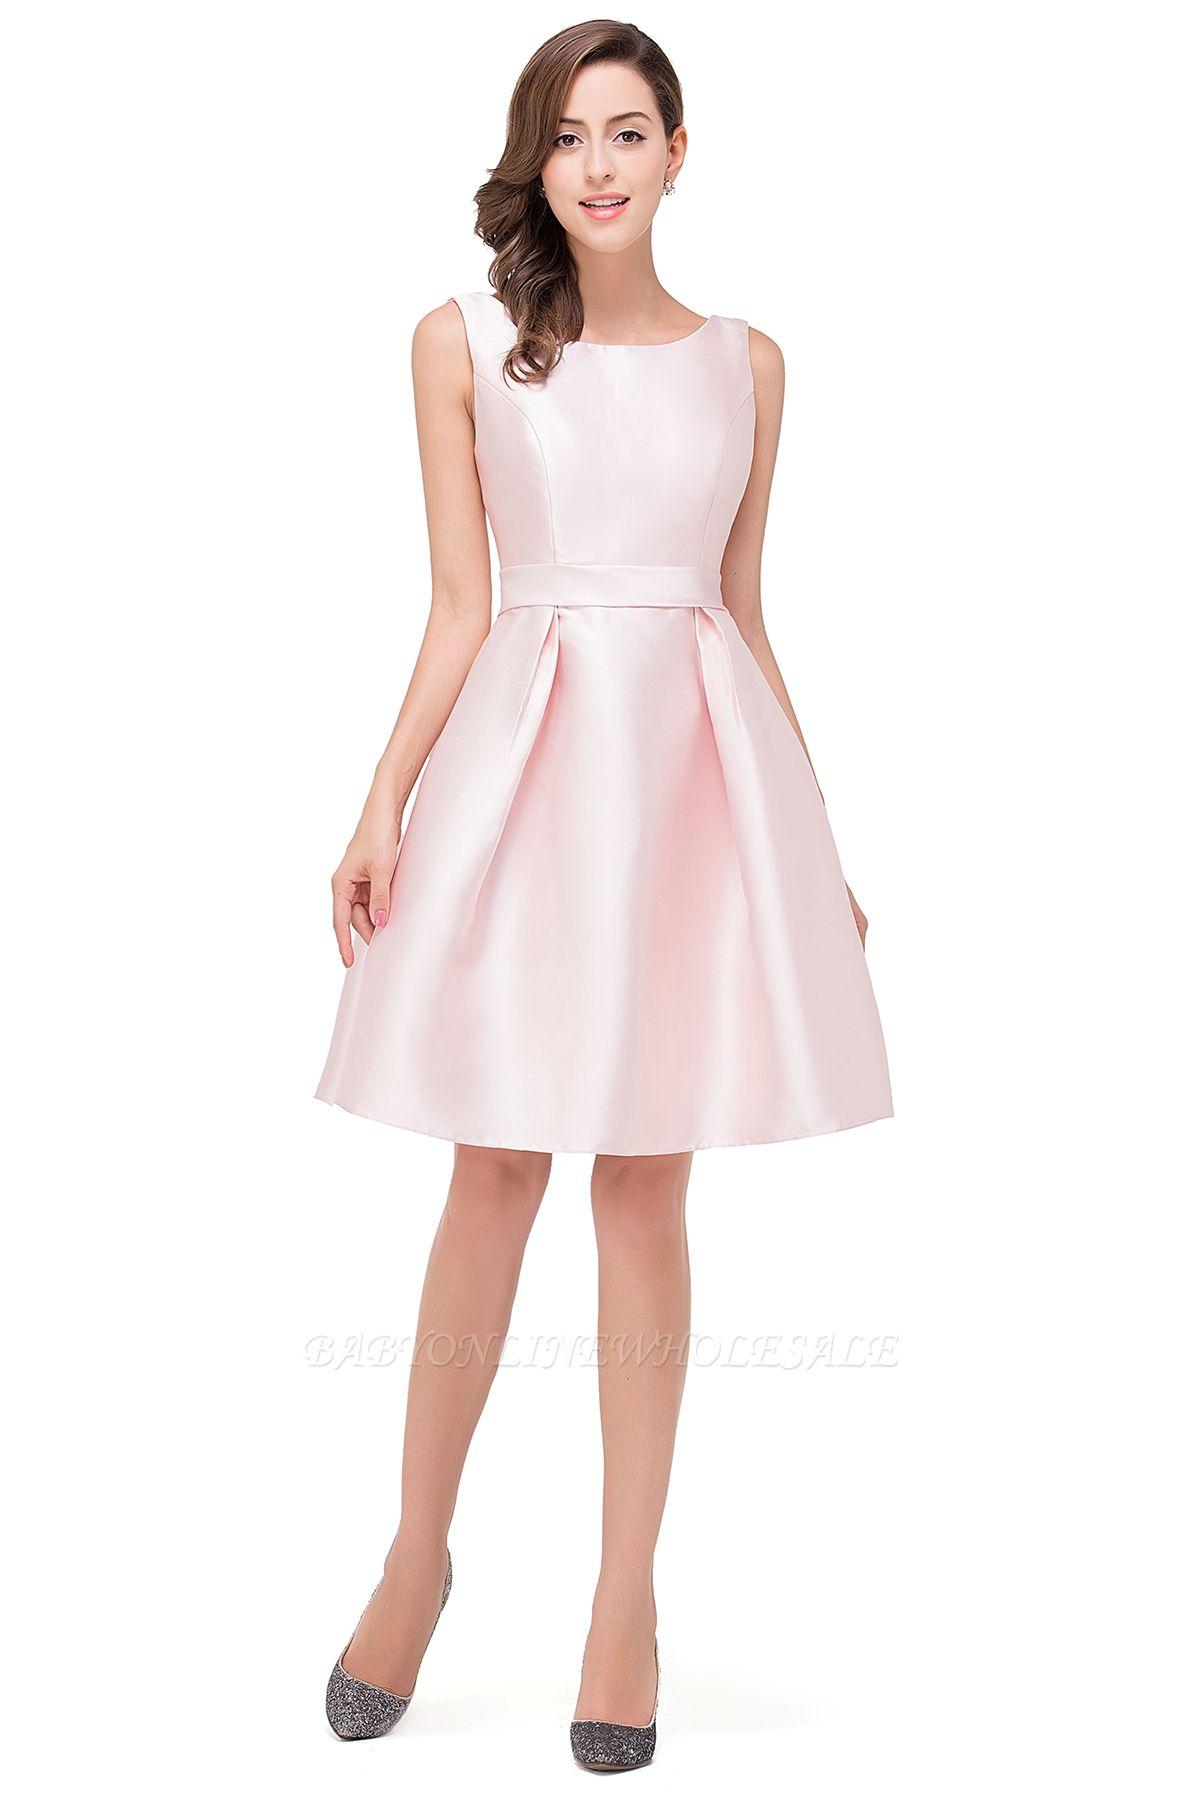 EMERSON | A-Line Sleeveless Knee Length Short Prom Dresses